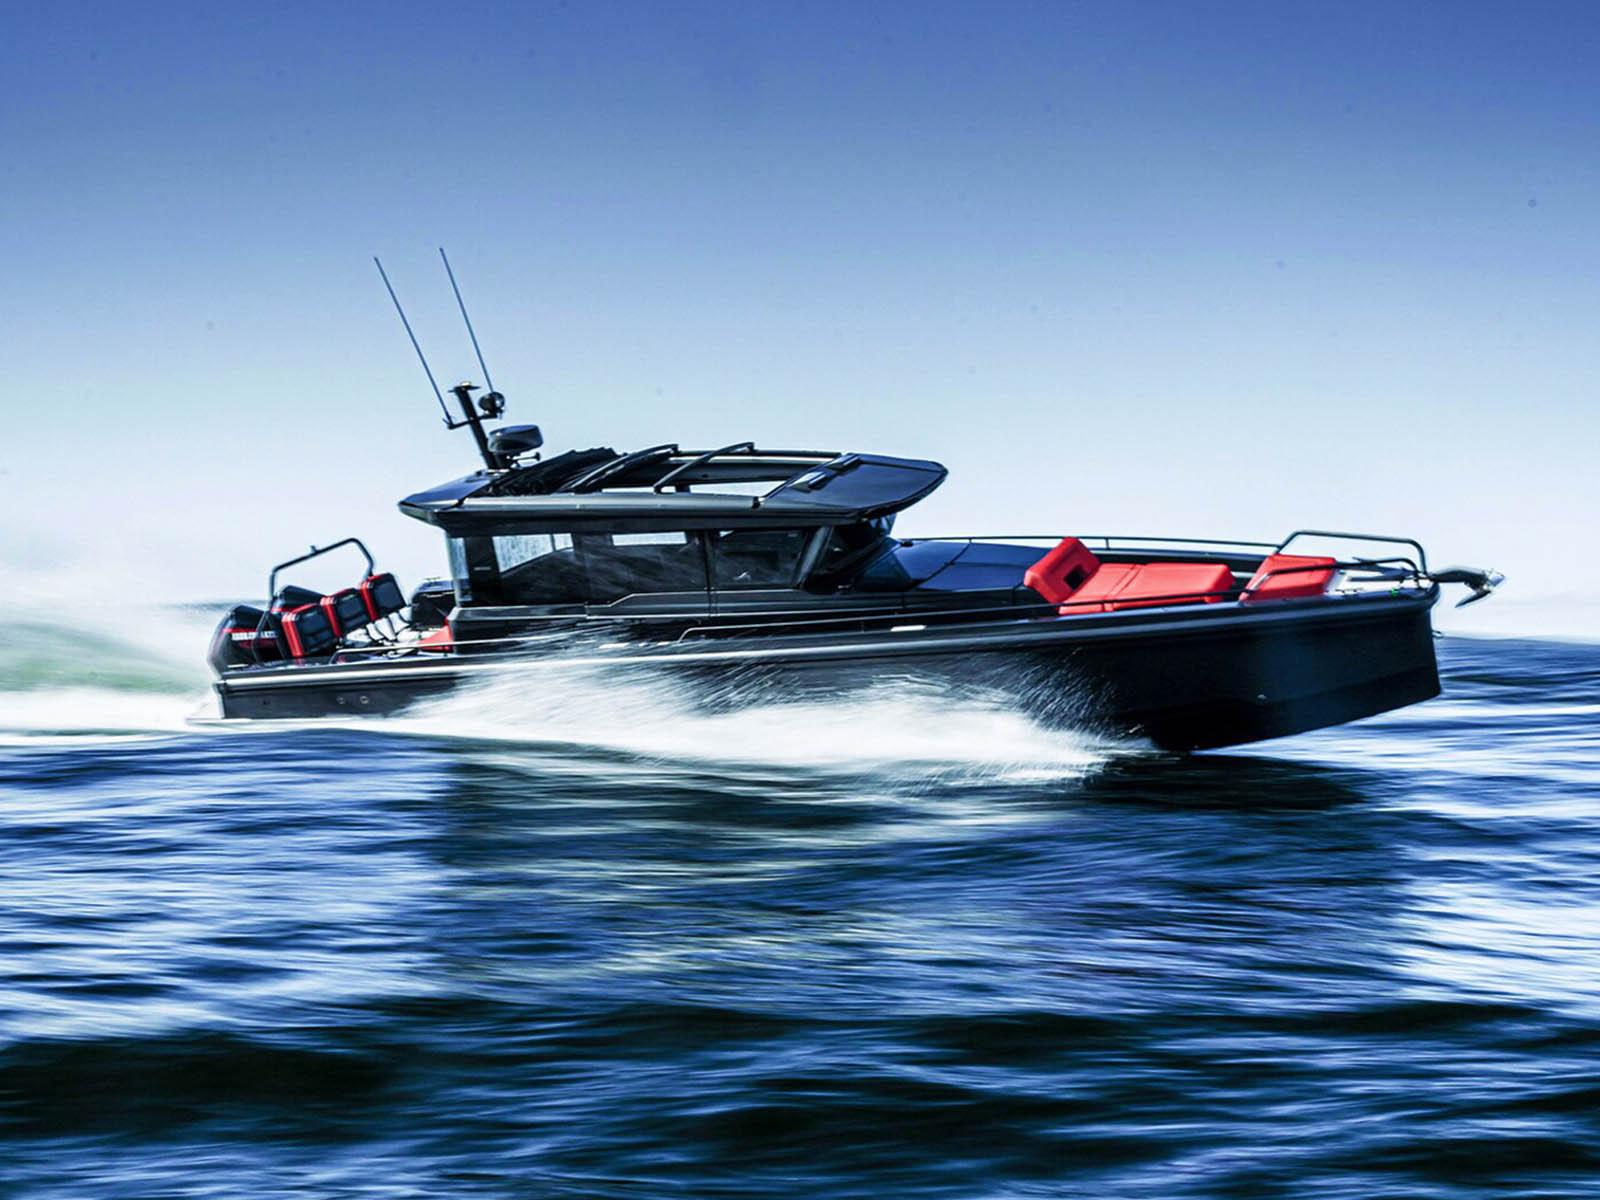 pam01240-officine-panerai-submersible-s-brabus-shadow-black-ops-4.jpg